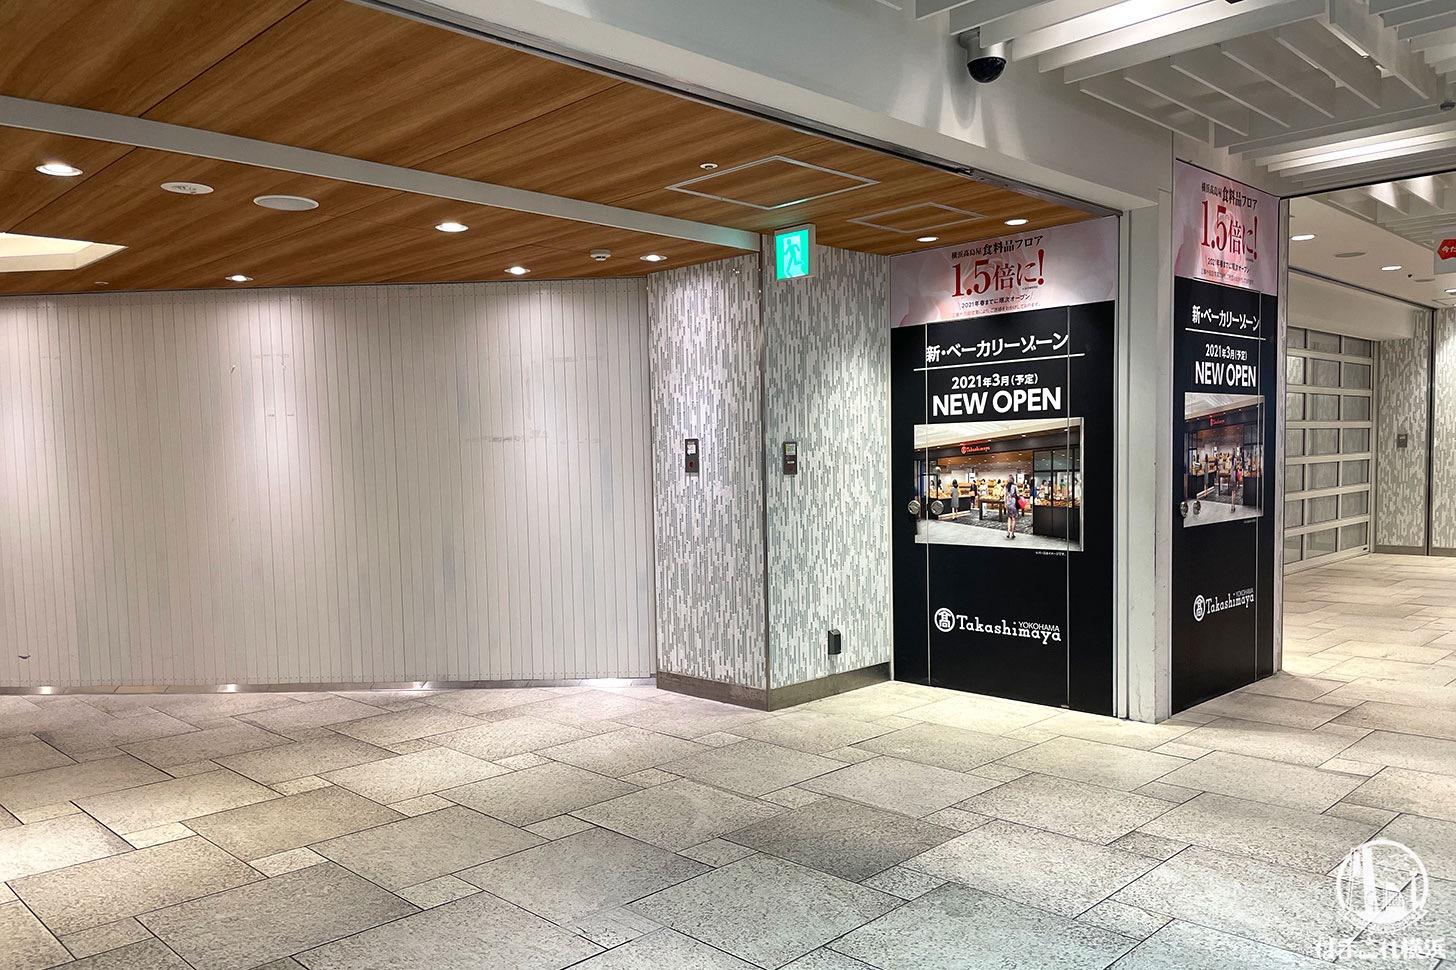 横浜高島屋 食料品エリア改装